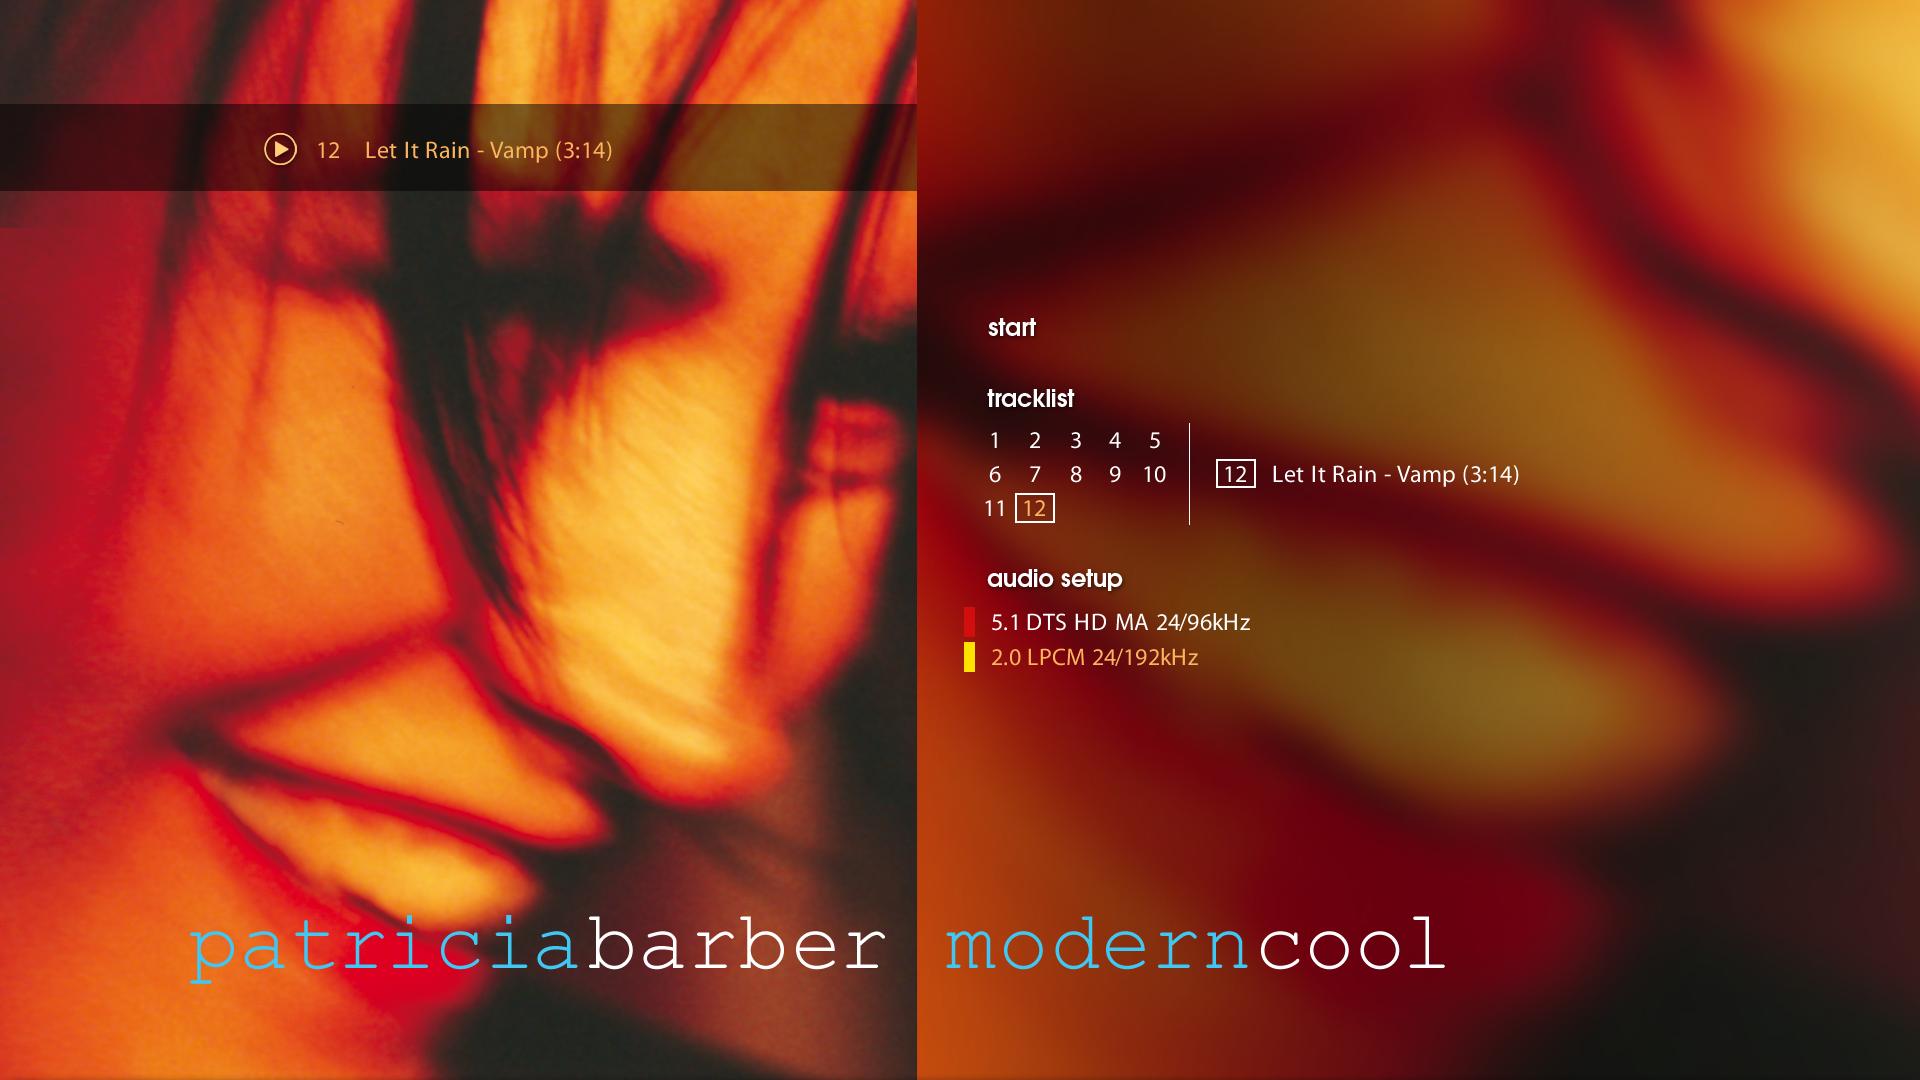 1998 Patricia Barber - Modern Cool (2012) {Premonition 90761-4} [Blu-ray Audio] 1